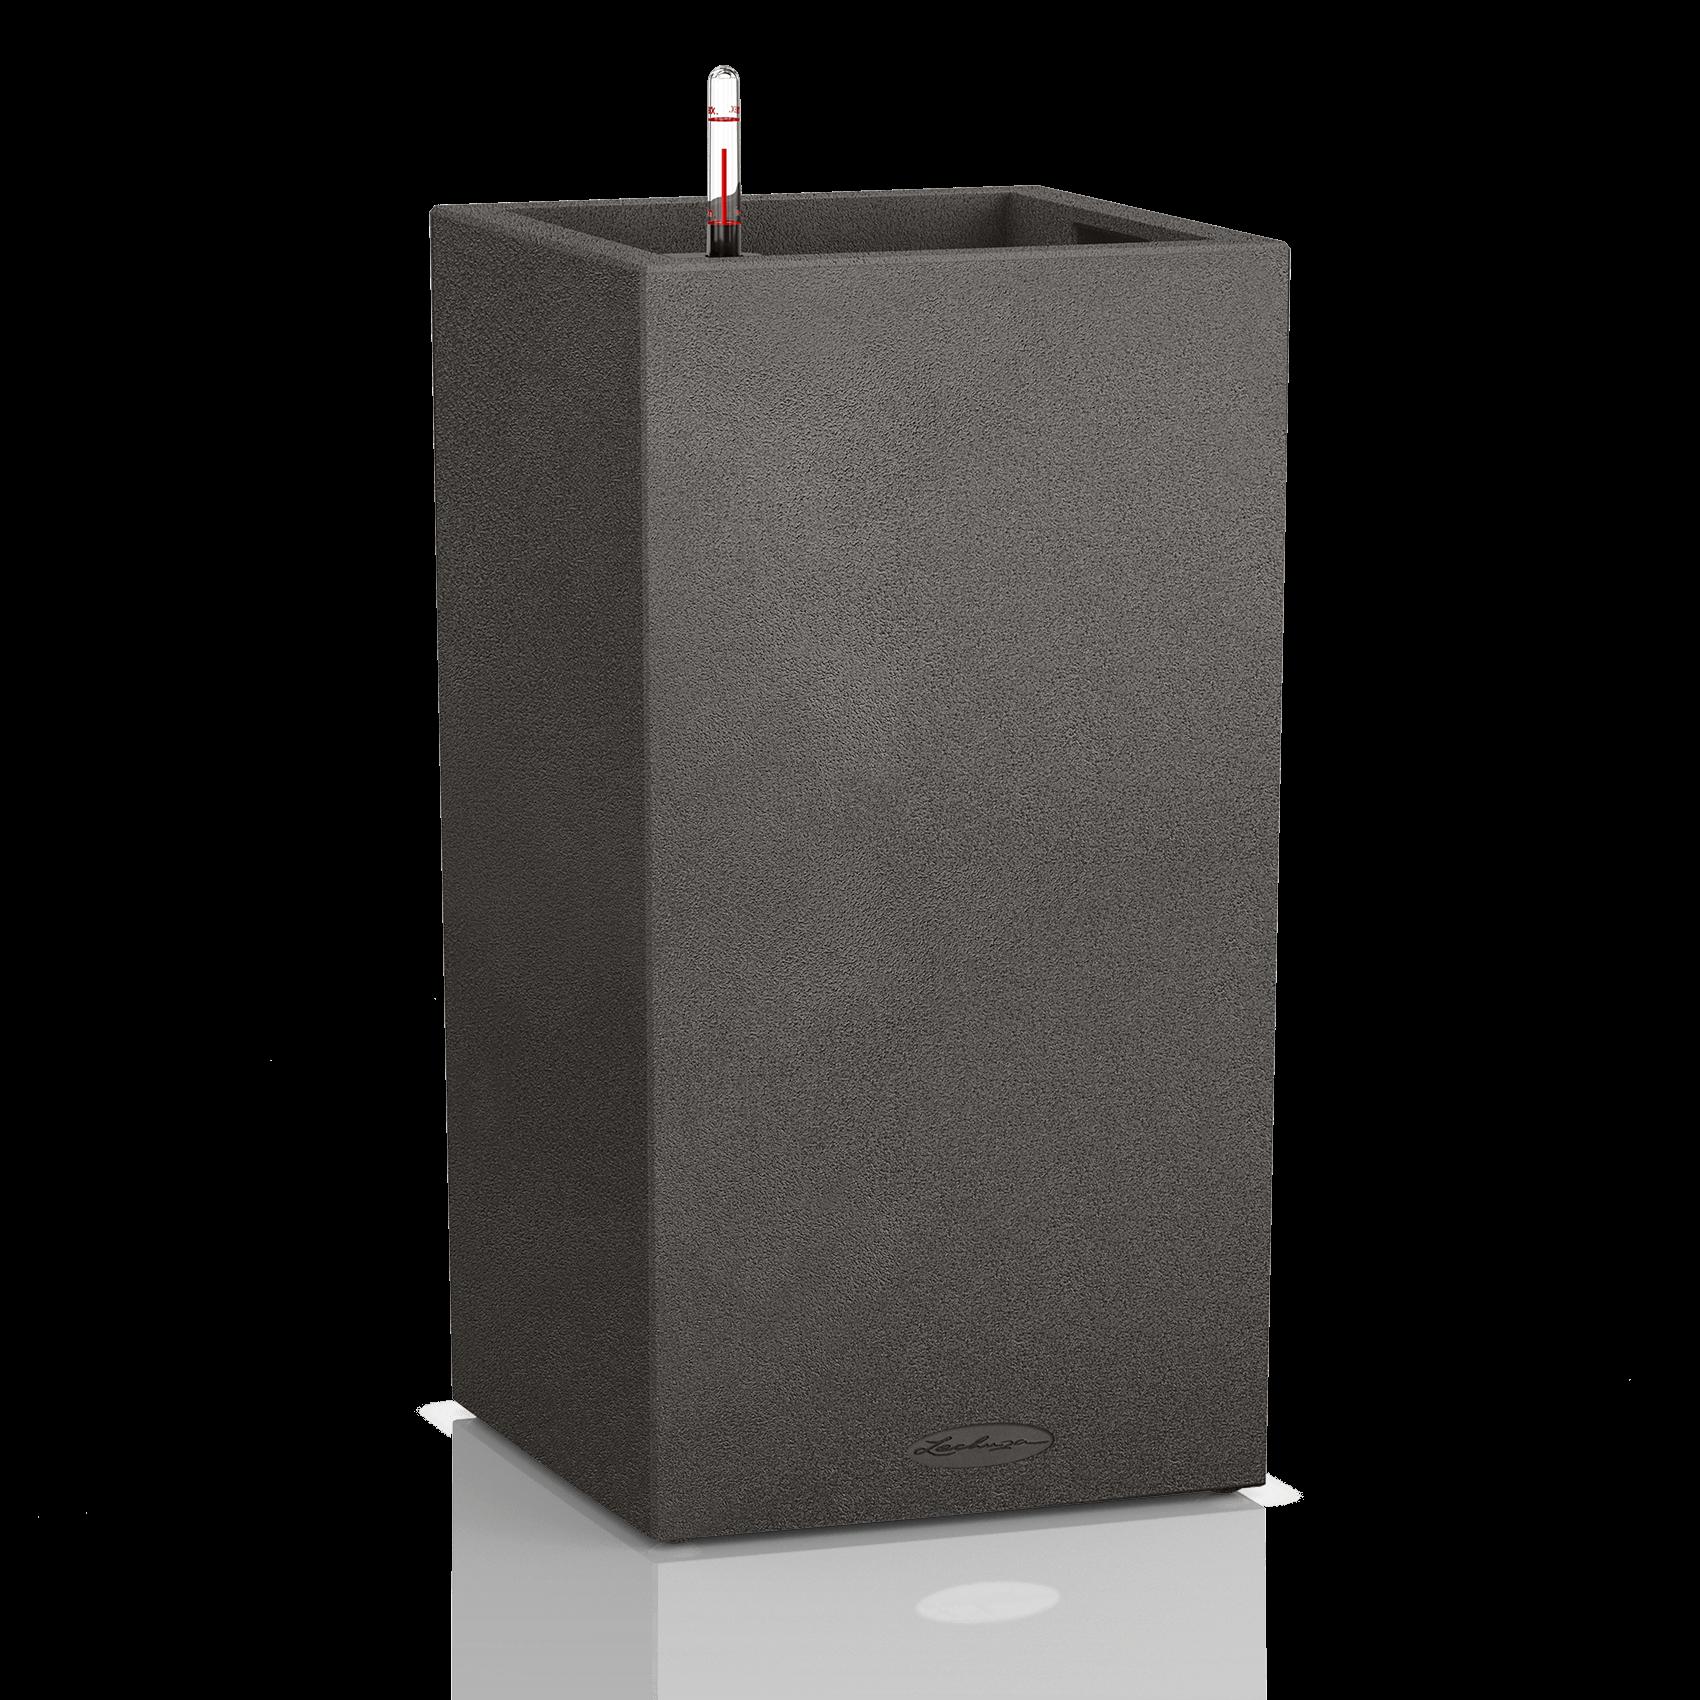 CANTO Stone 30 high noir graphite